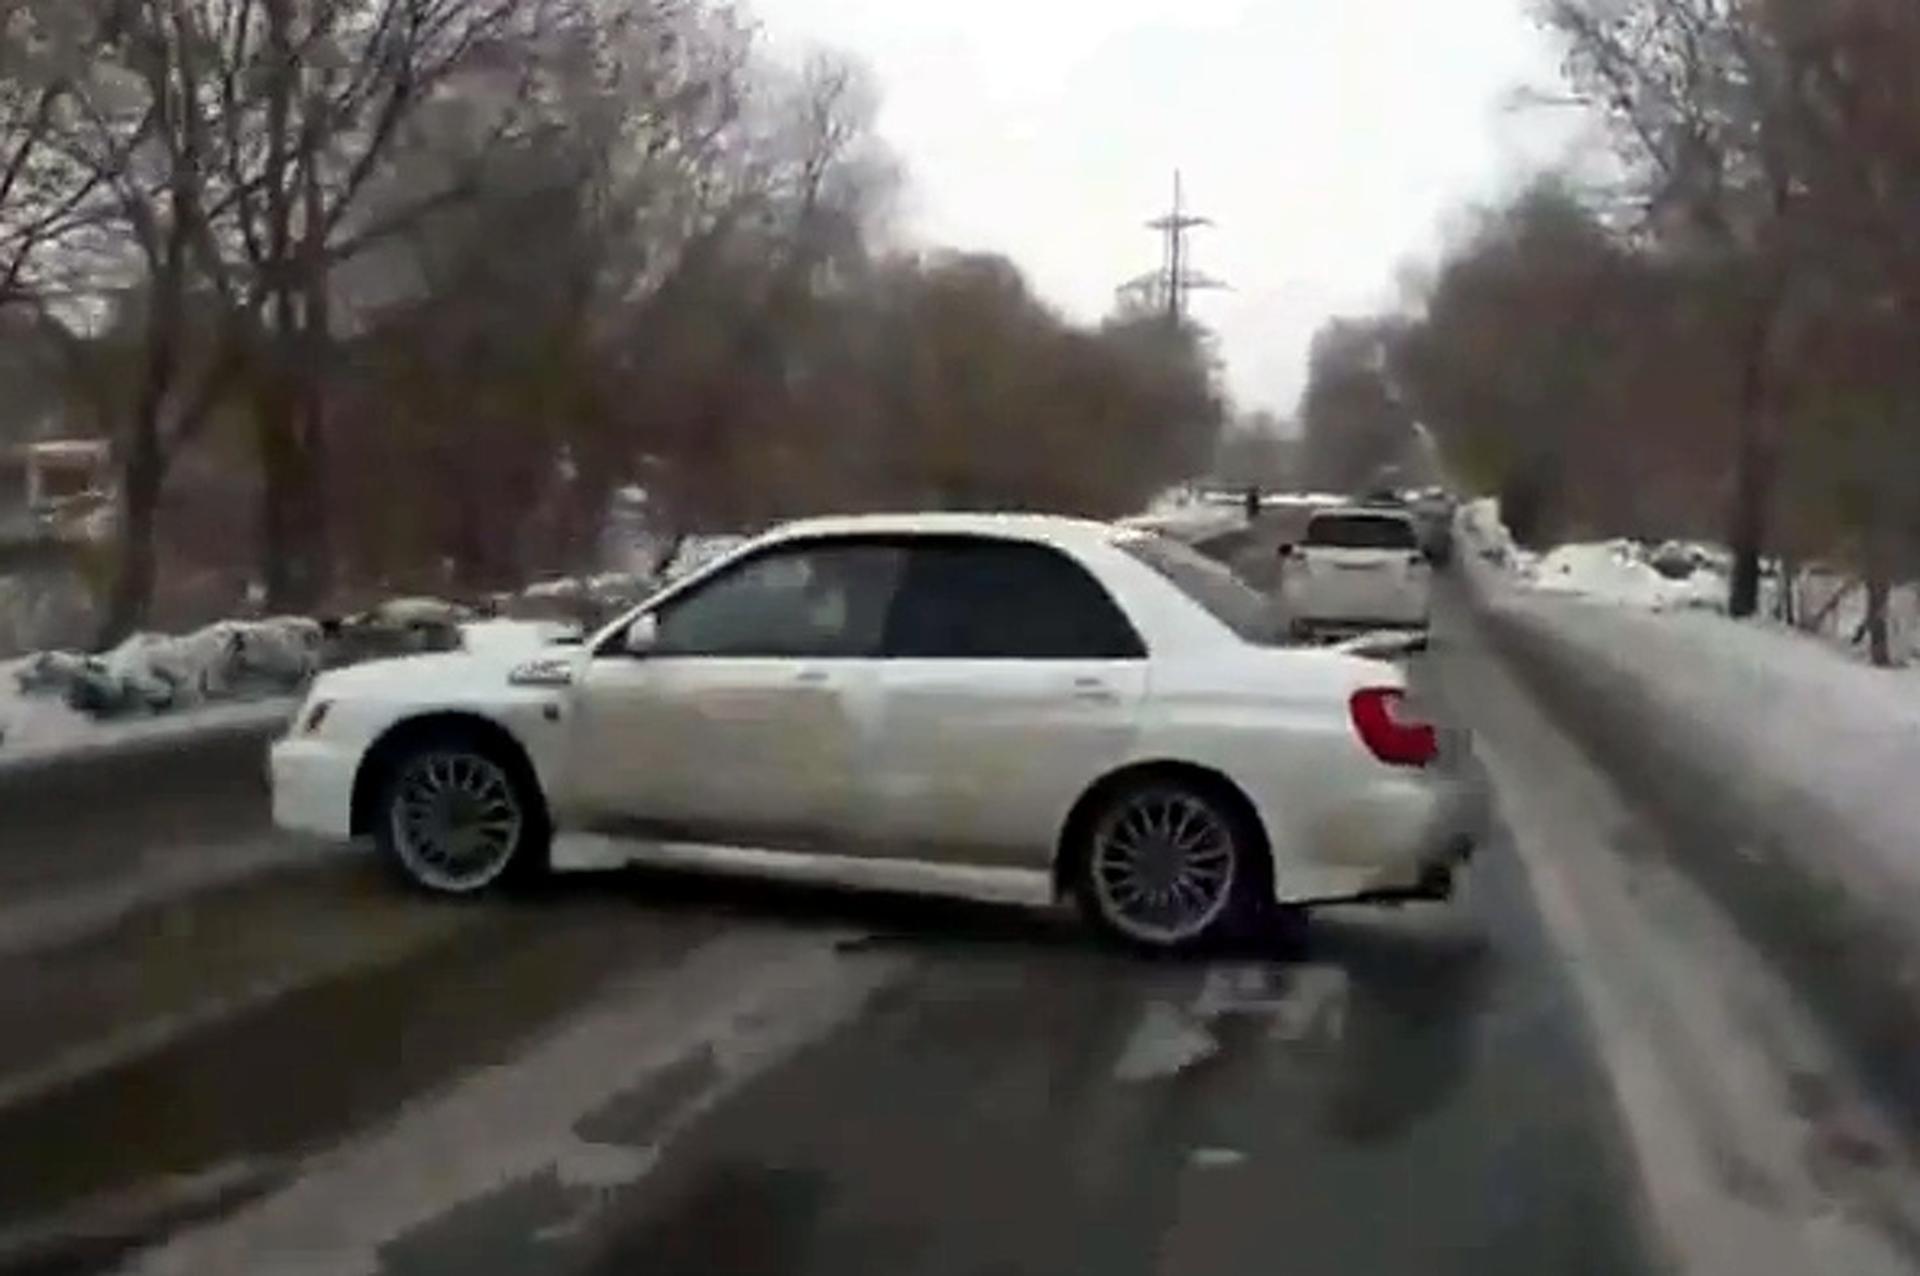 Subaru WRX Driver 360s Way Out of a Potential Crash